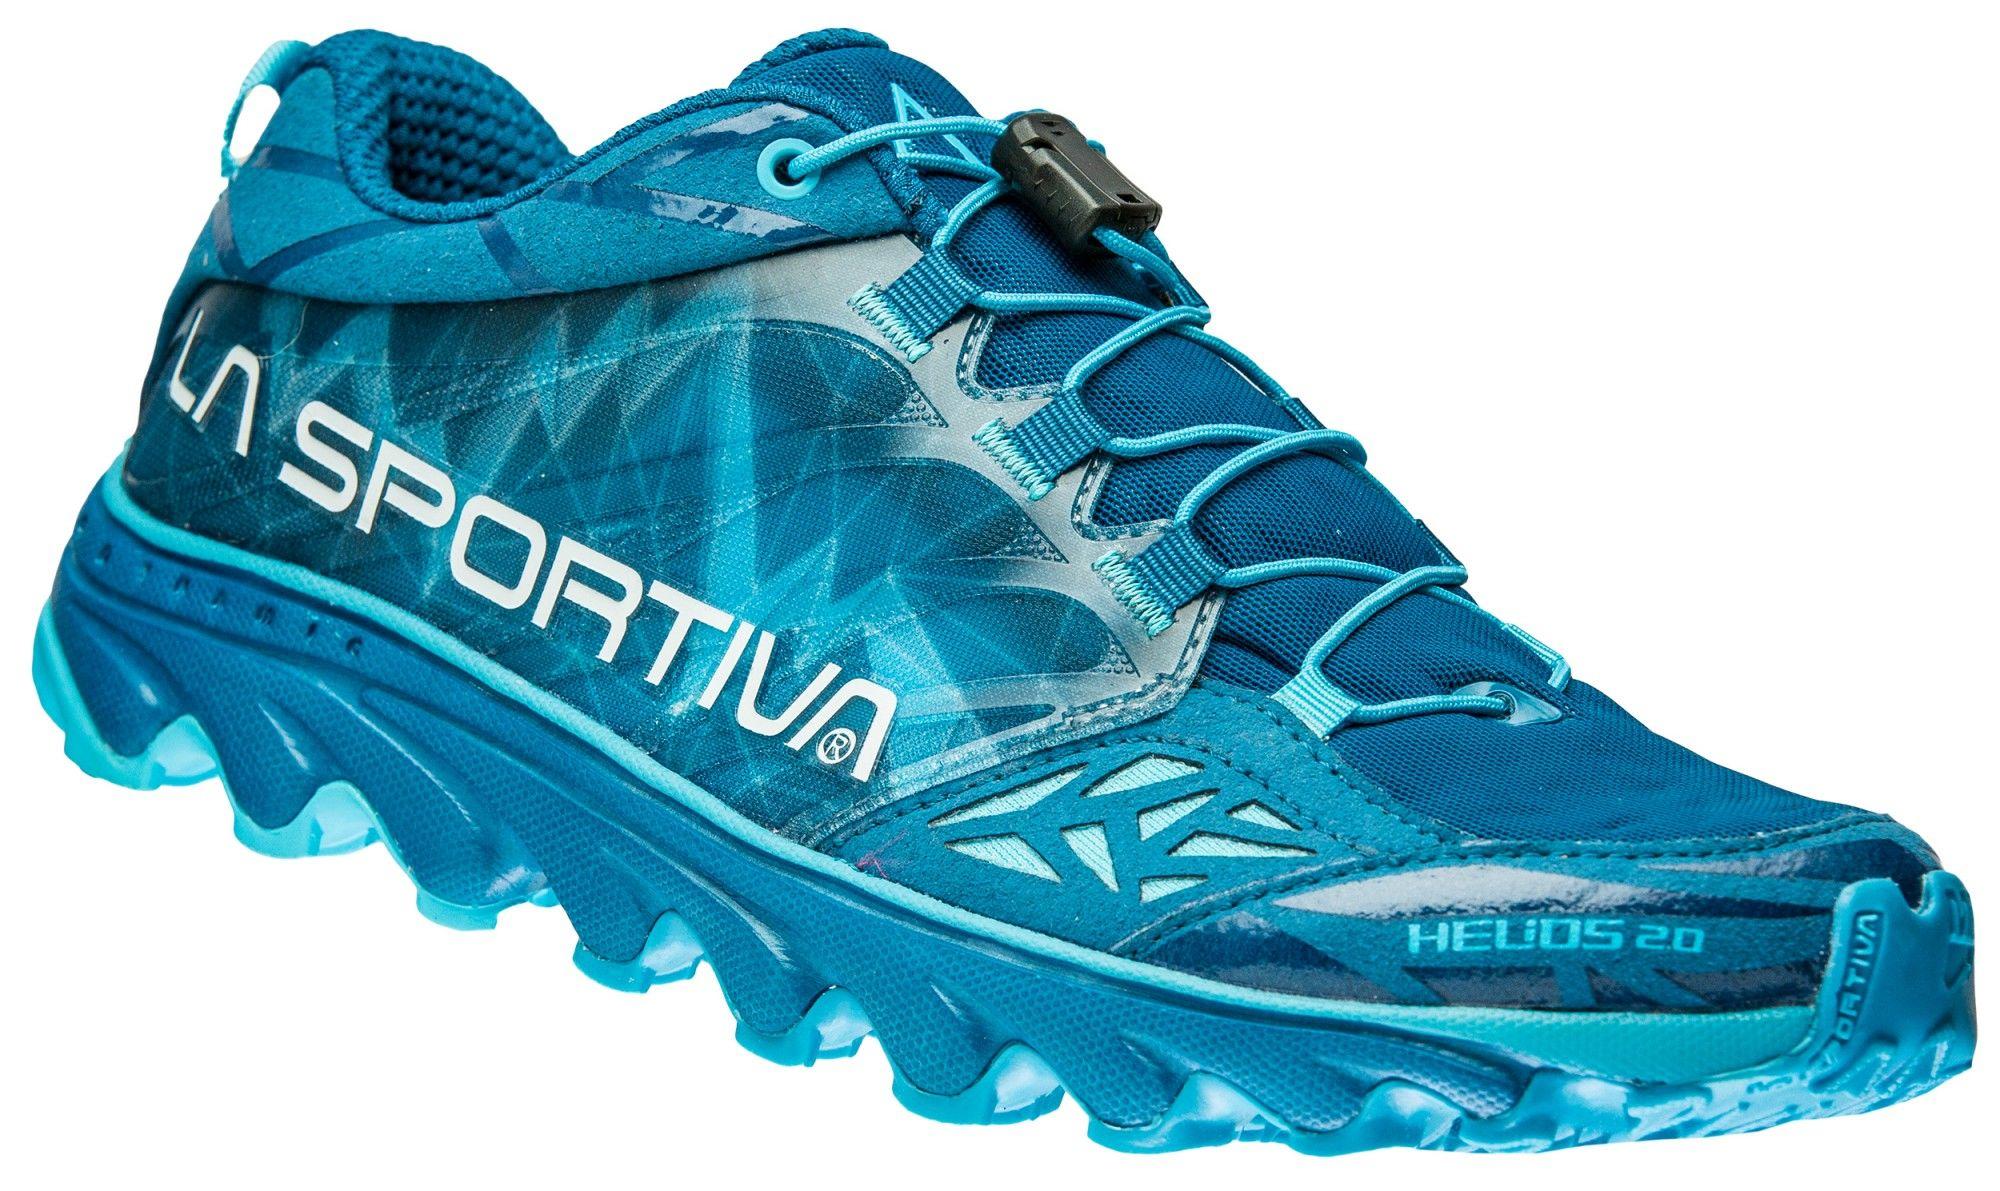 La Sportiva Helios 2.0 Blau, Female EU 36.5 -Farbe Fjord, 36.5